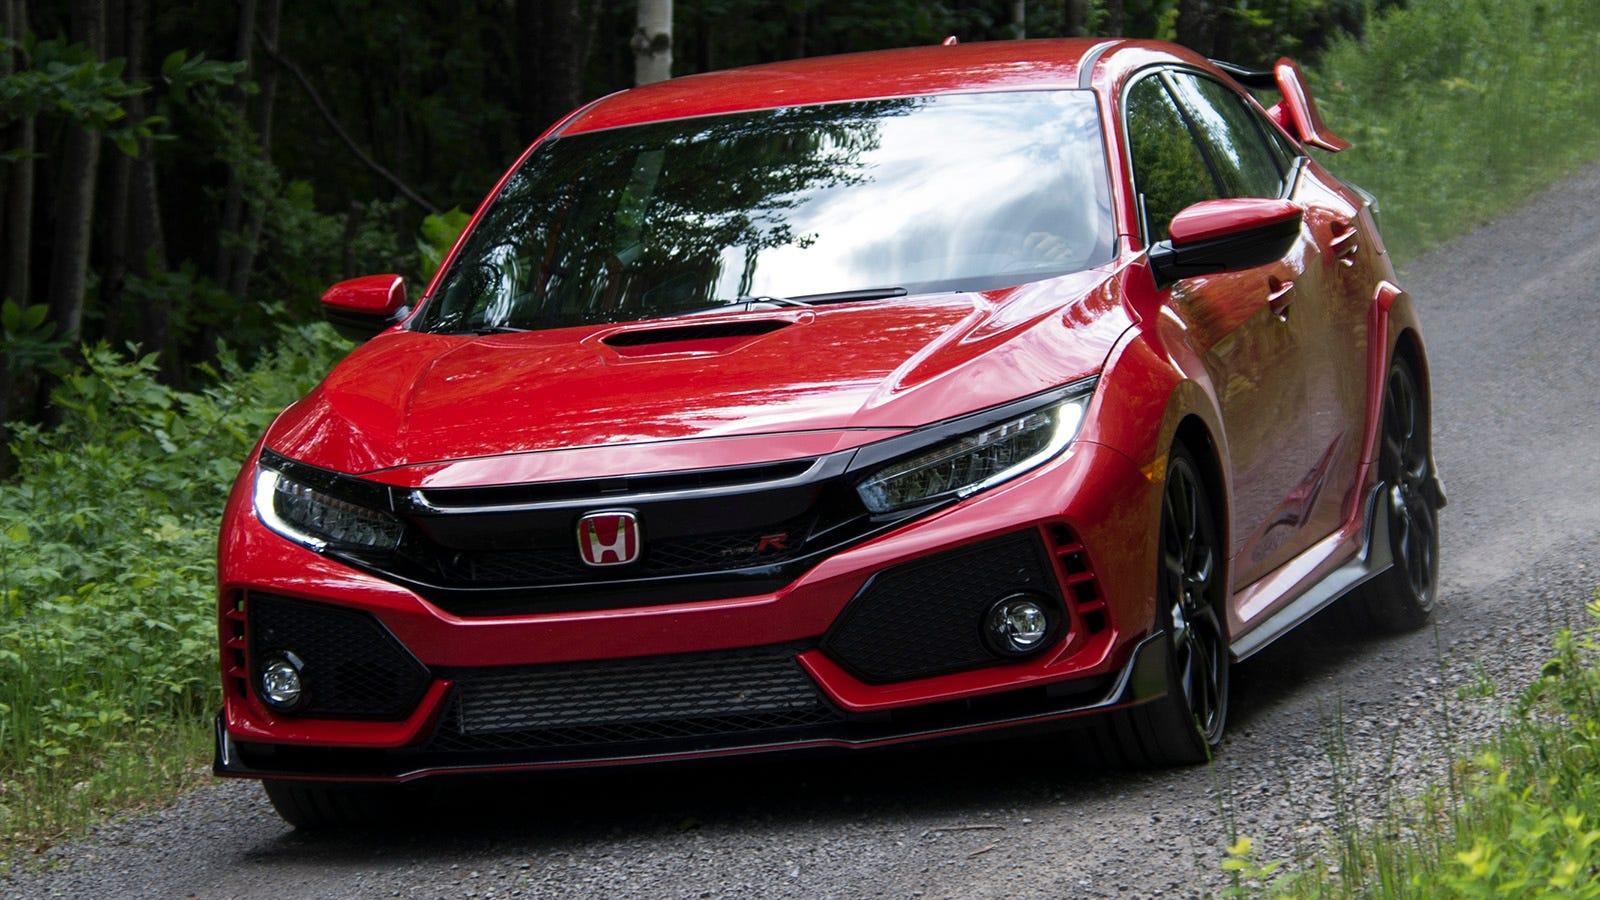 Honda civic 2018 modified red